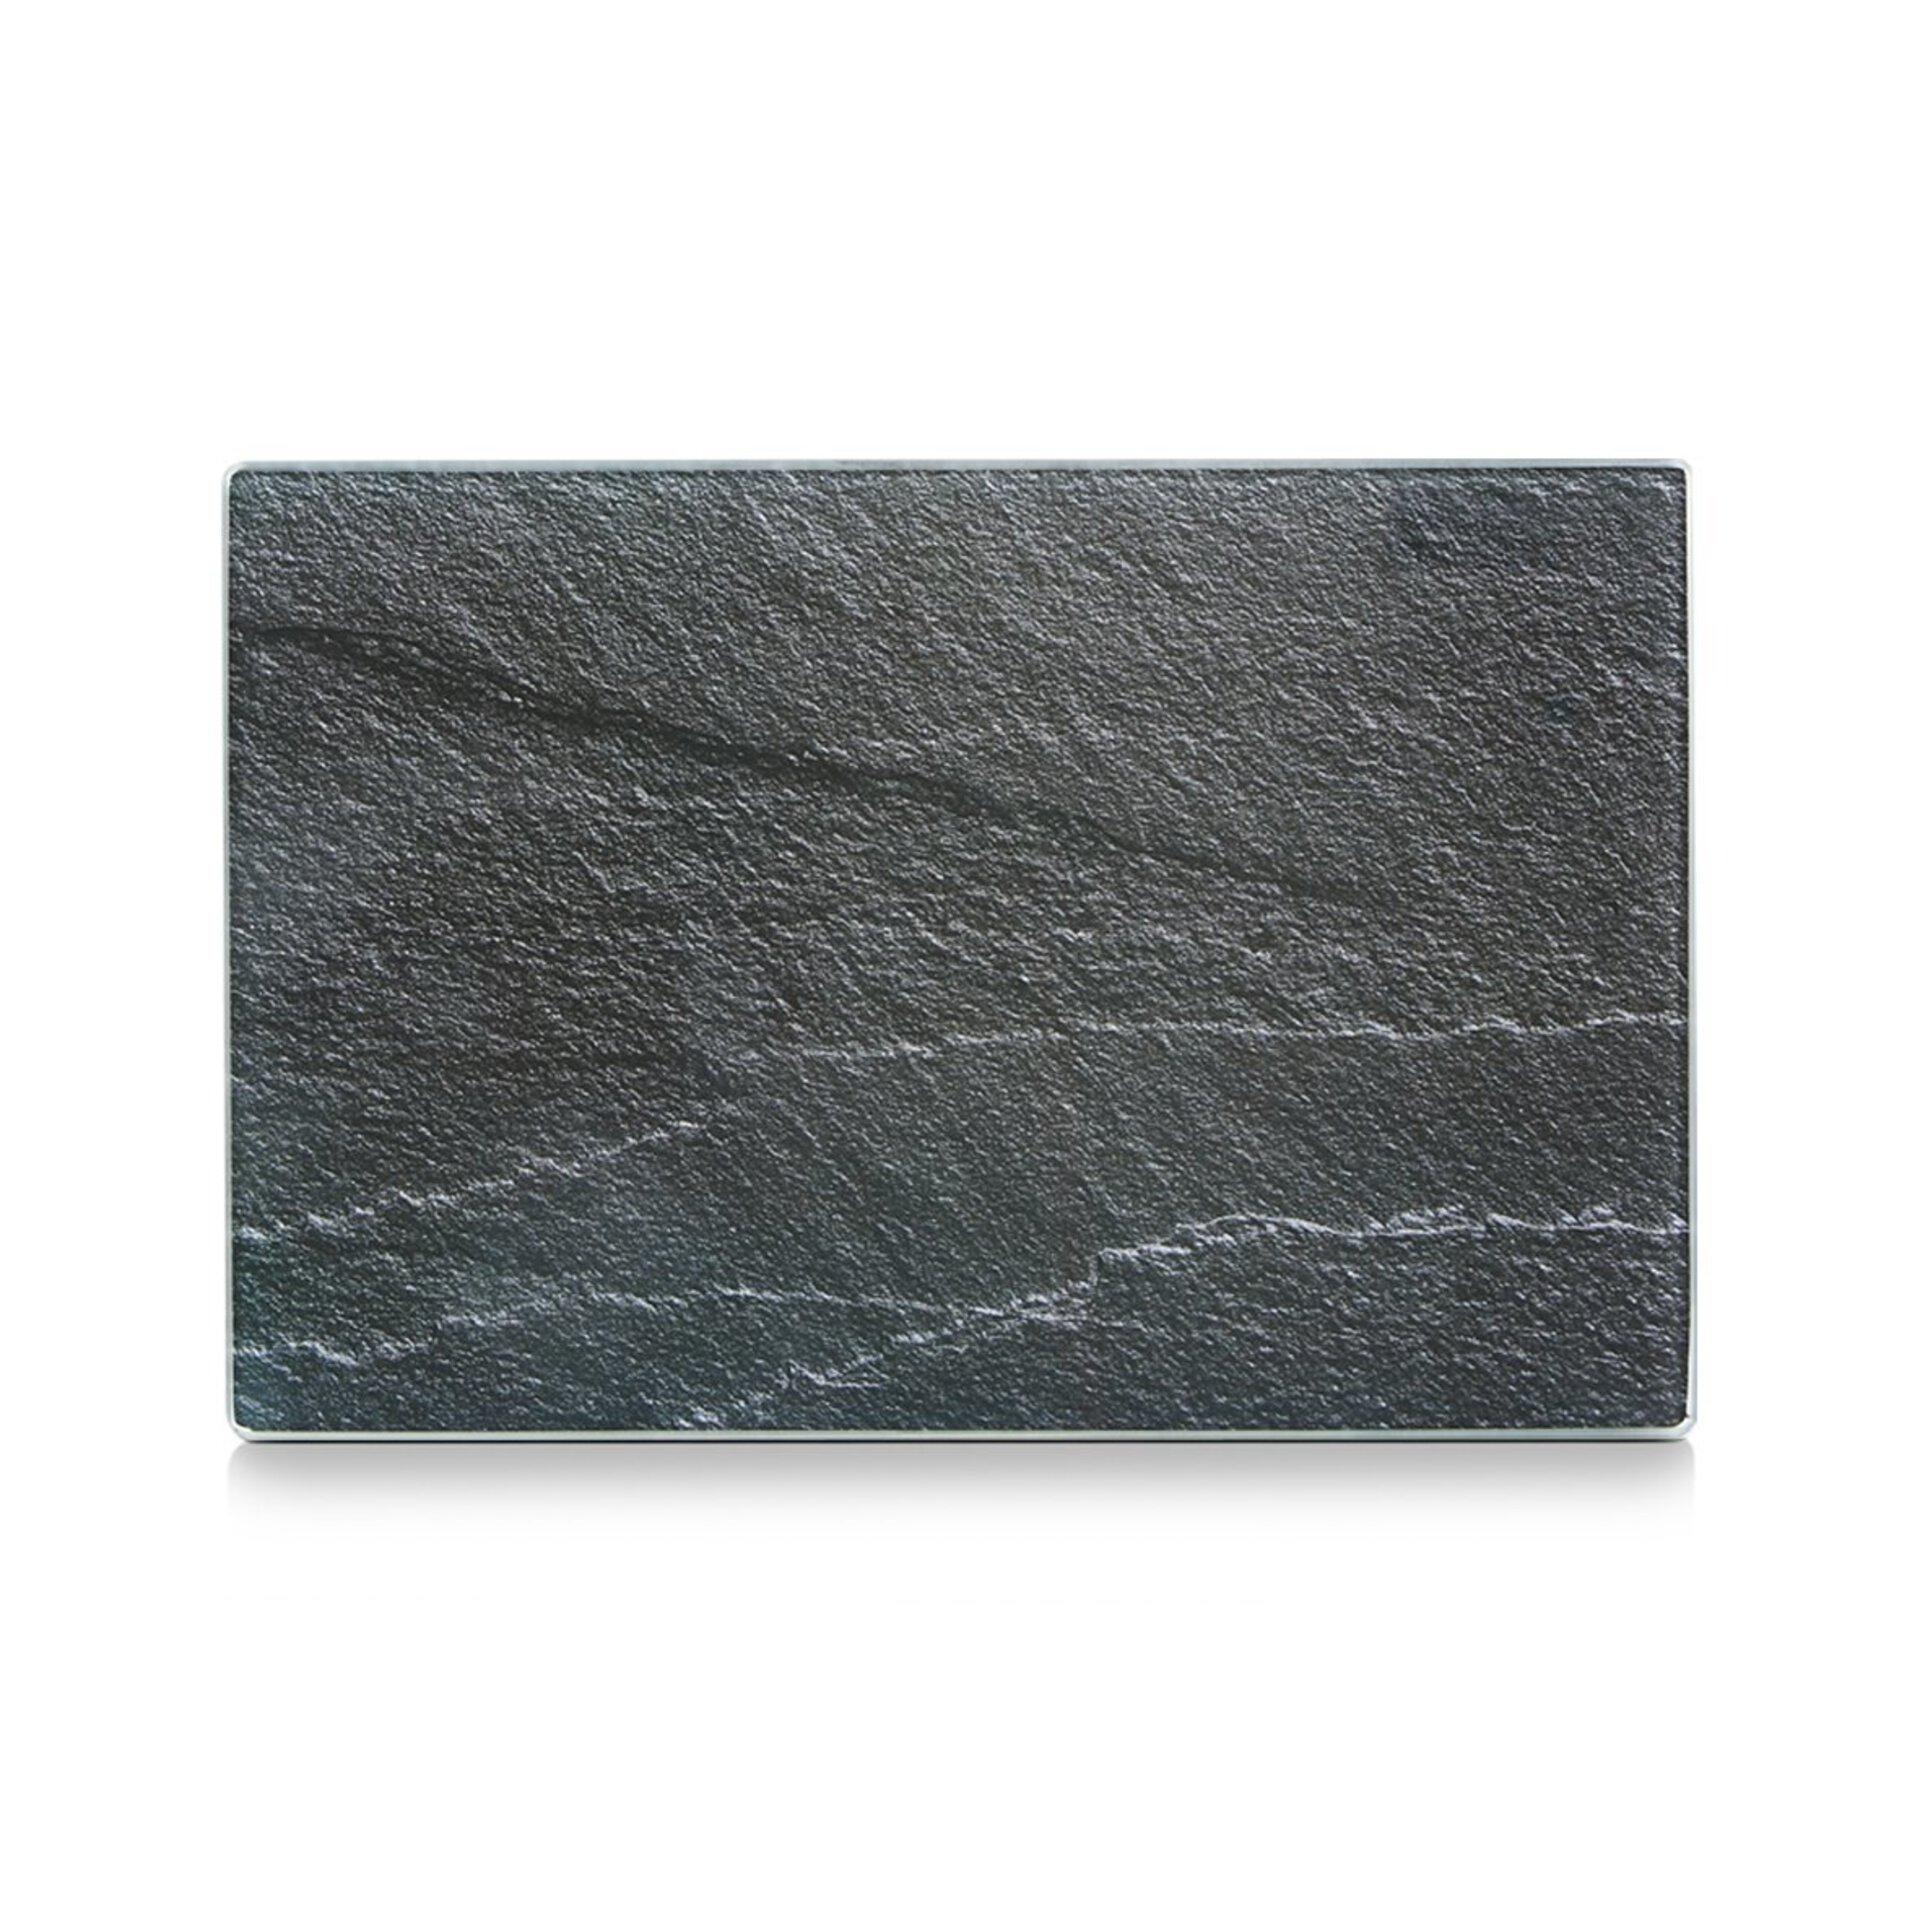 Schneidebrett Zeller Present Glas grau 20 x 30 cm